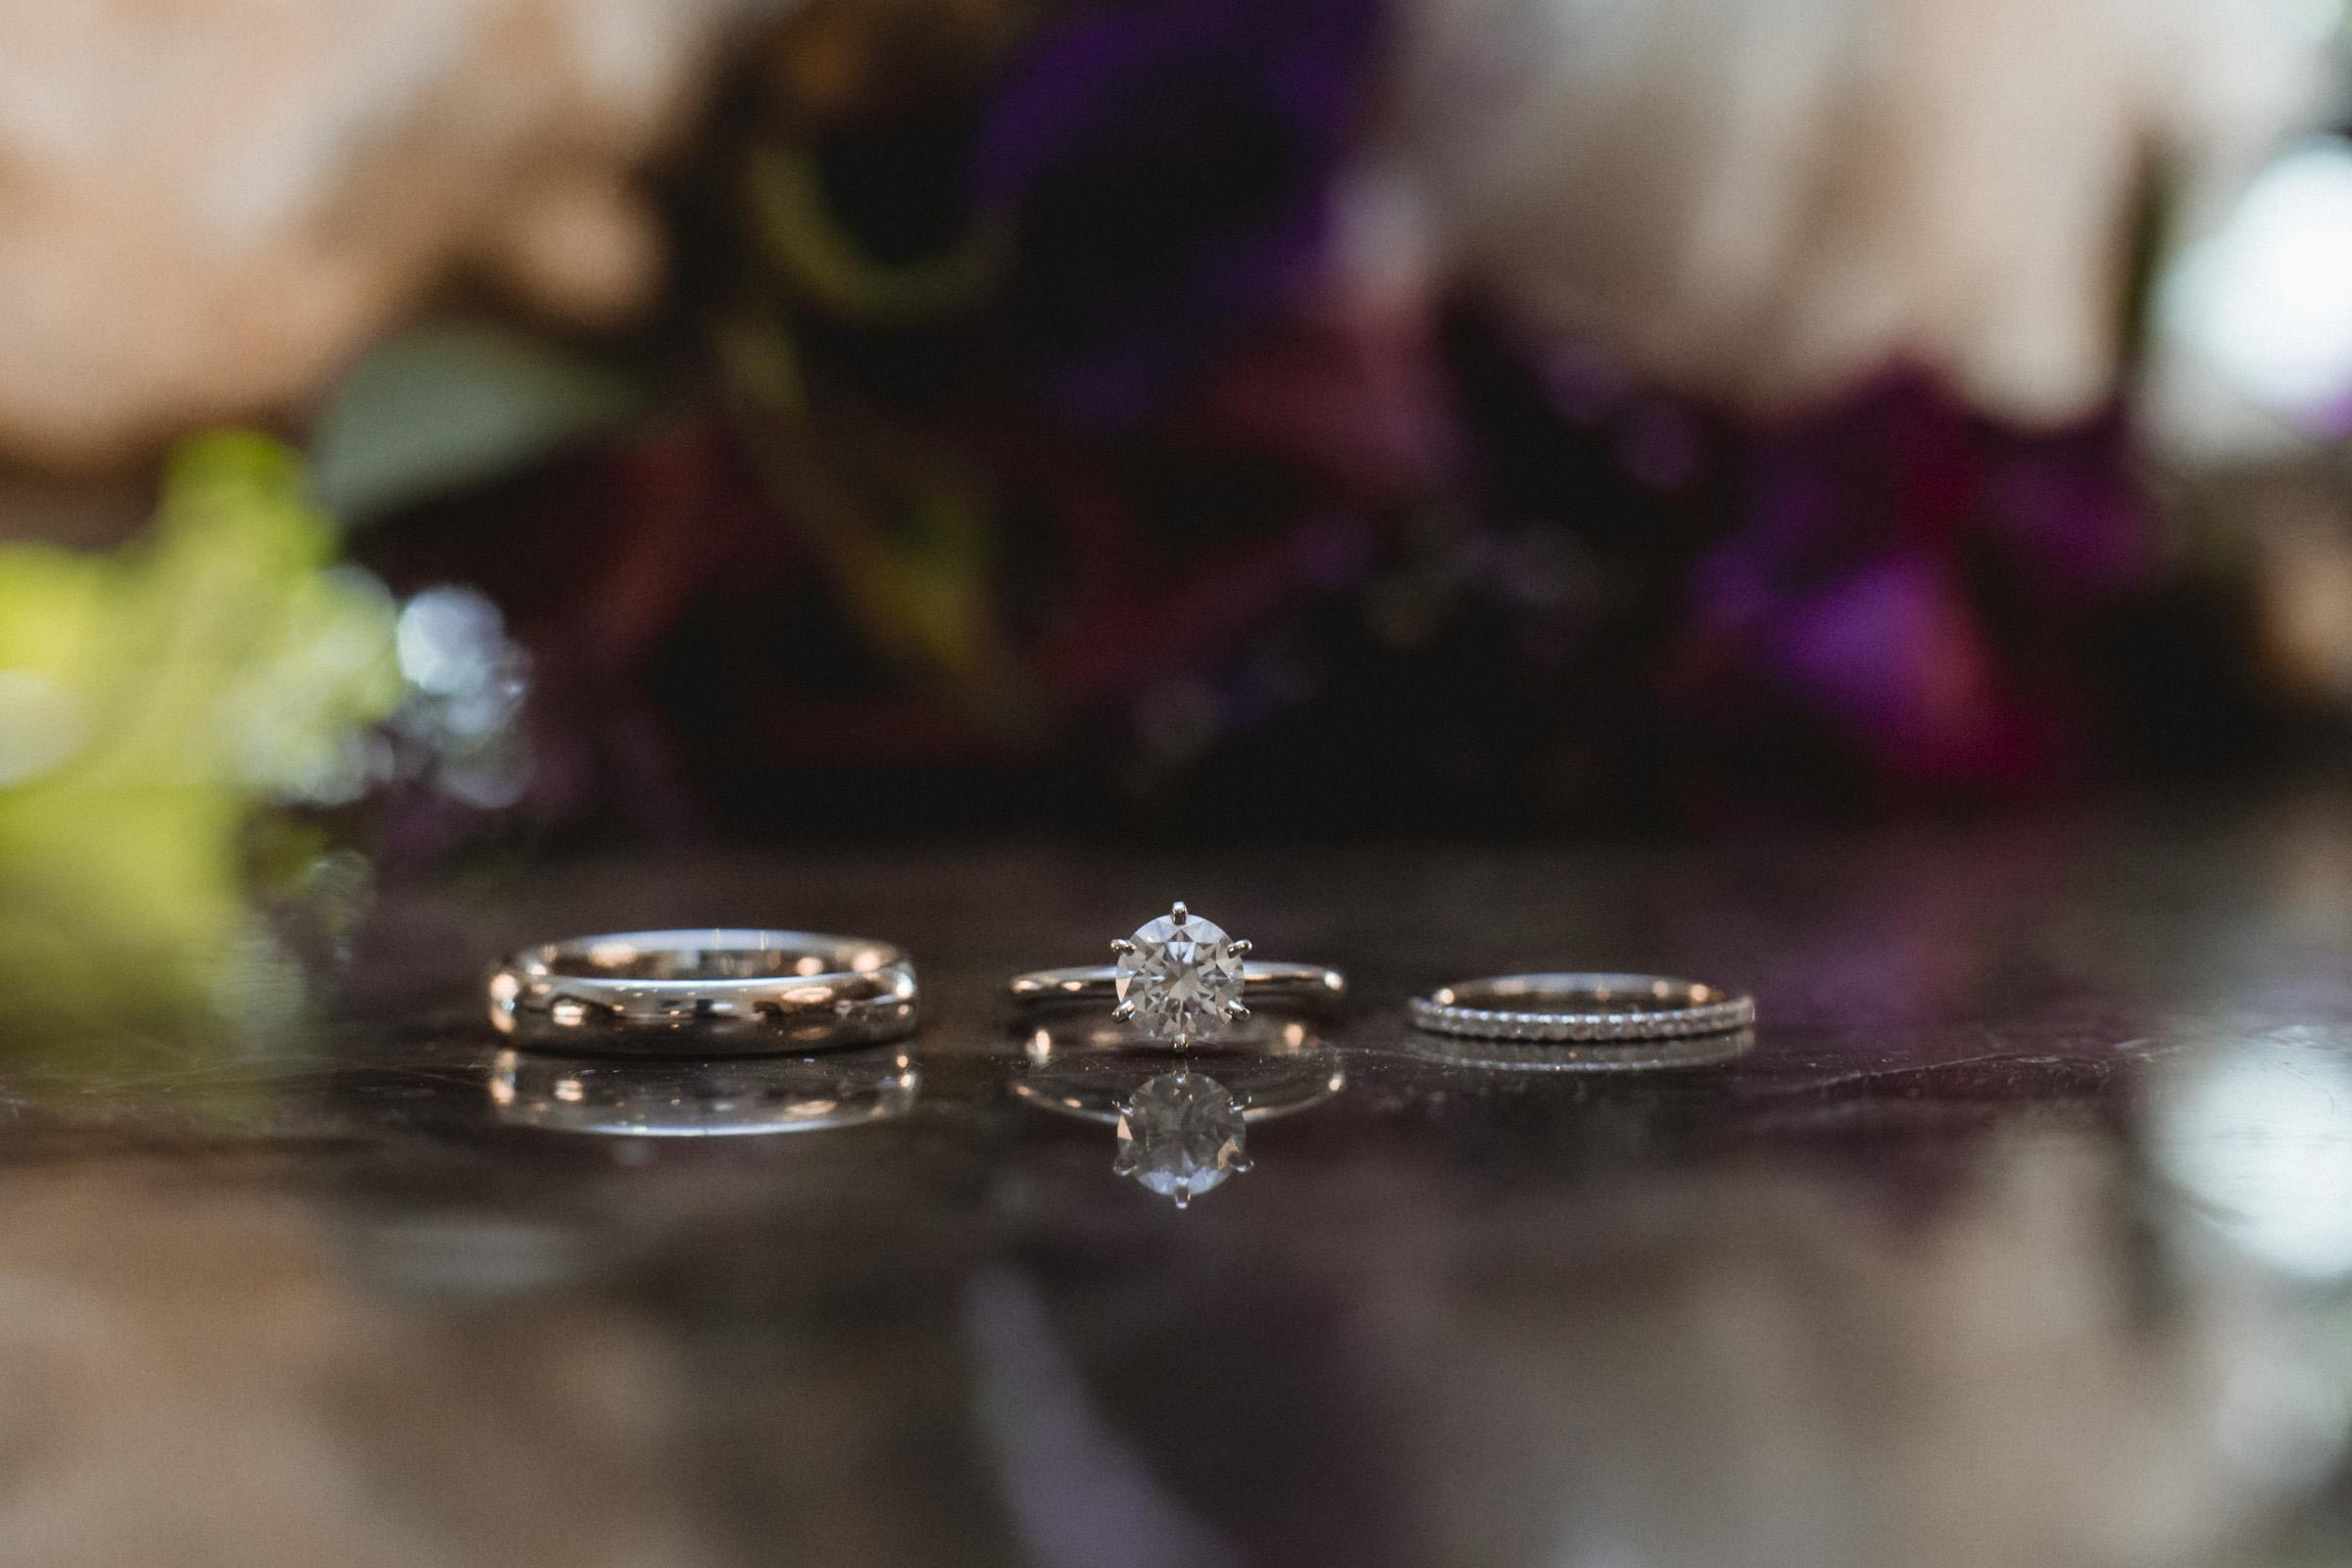 Wedding Rings - Estate at Florentine Gardens wedding - Hudson Valley Wedding - Kelsey & Anish's wedding - Amy Sims Photography